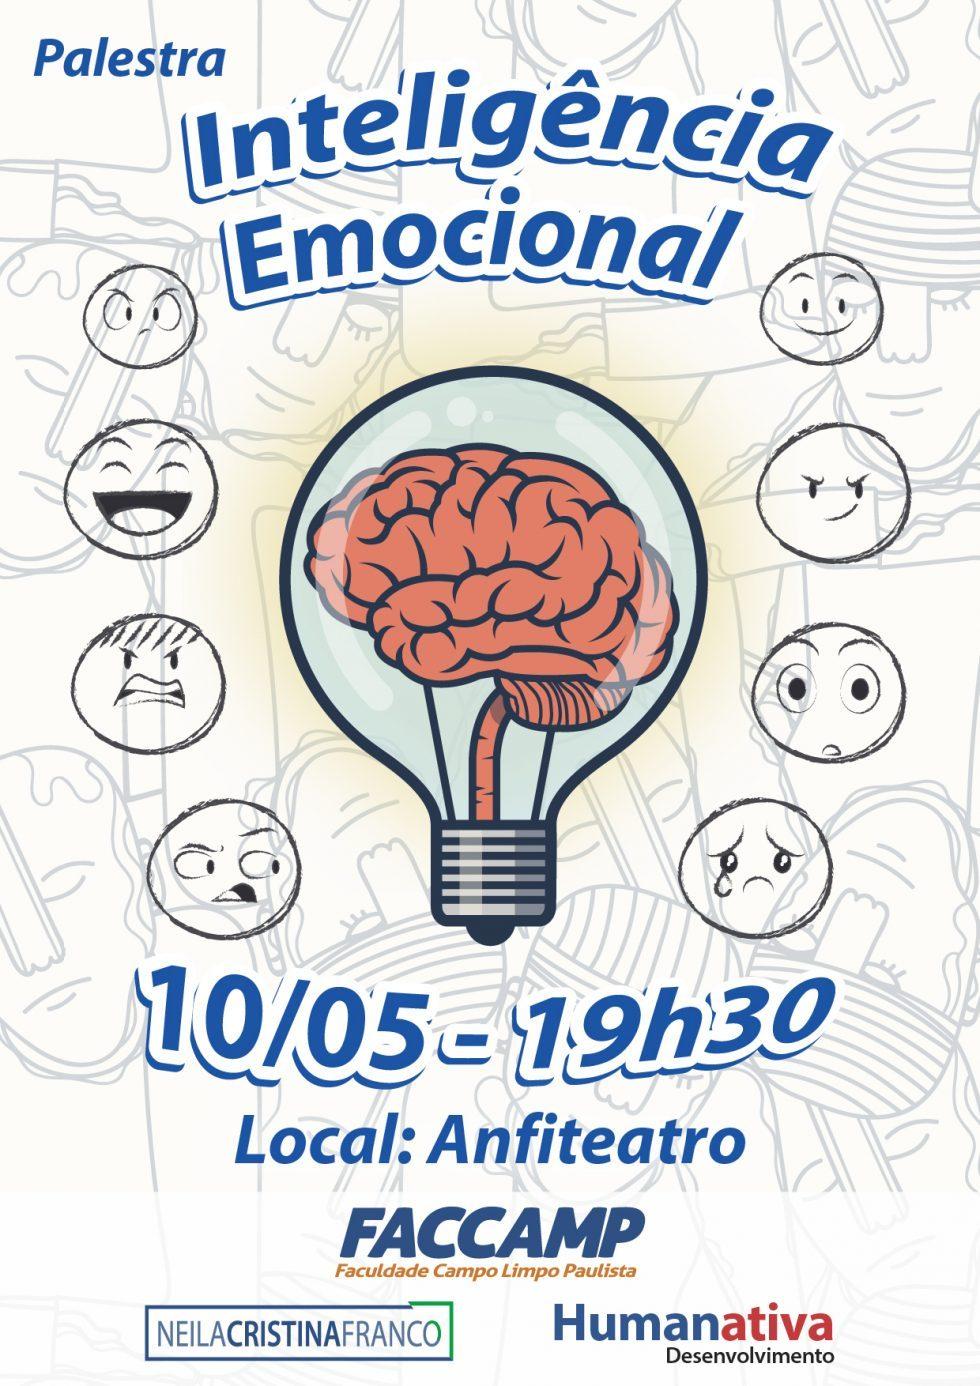 FACCAMP OFICINA DE CARREIRA: INTELIGÊNCIA EMOCIONAL